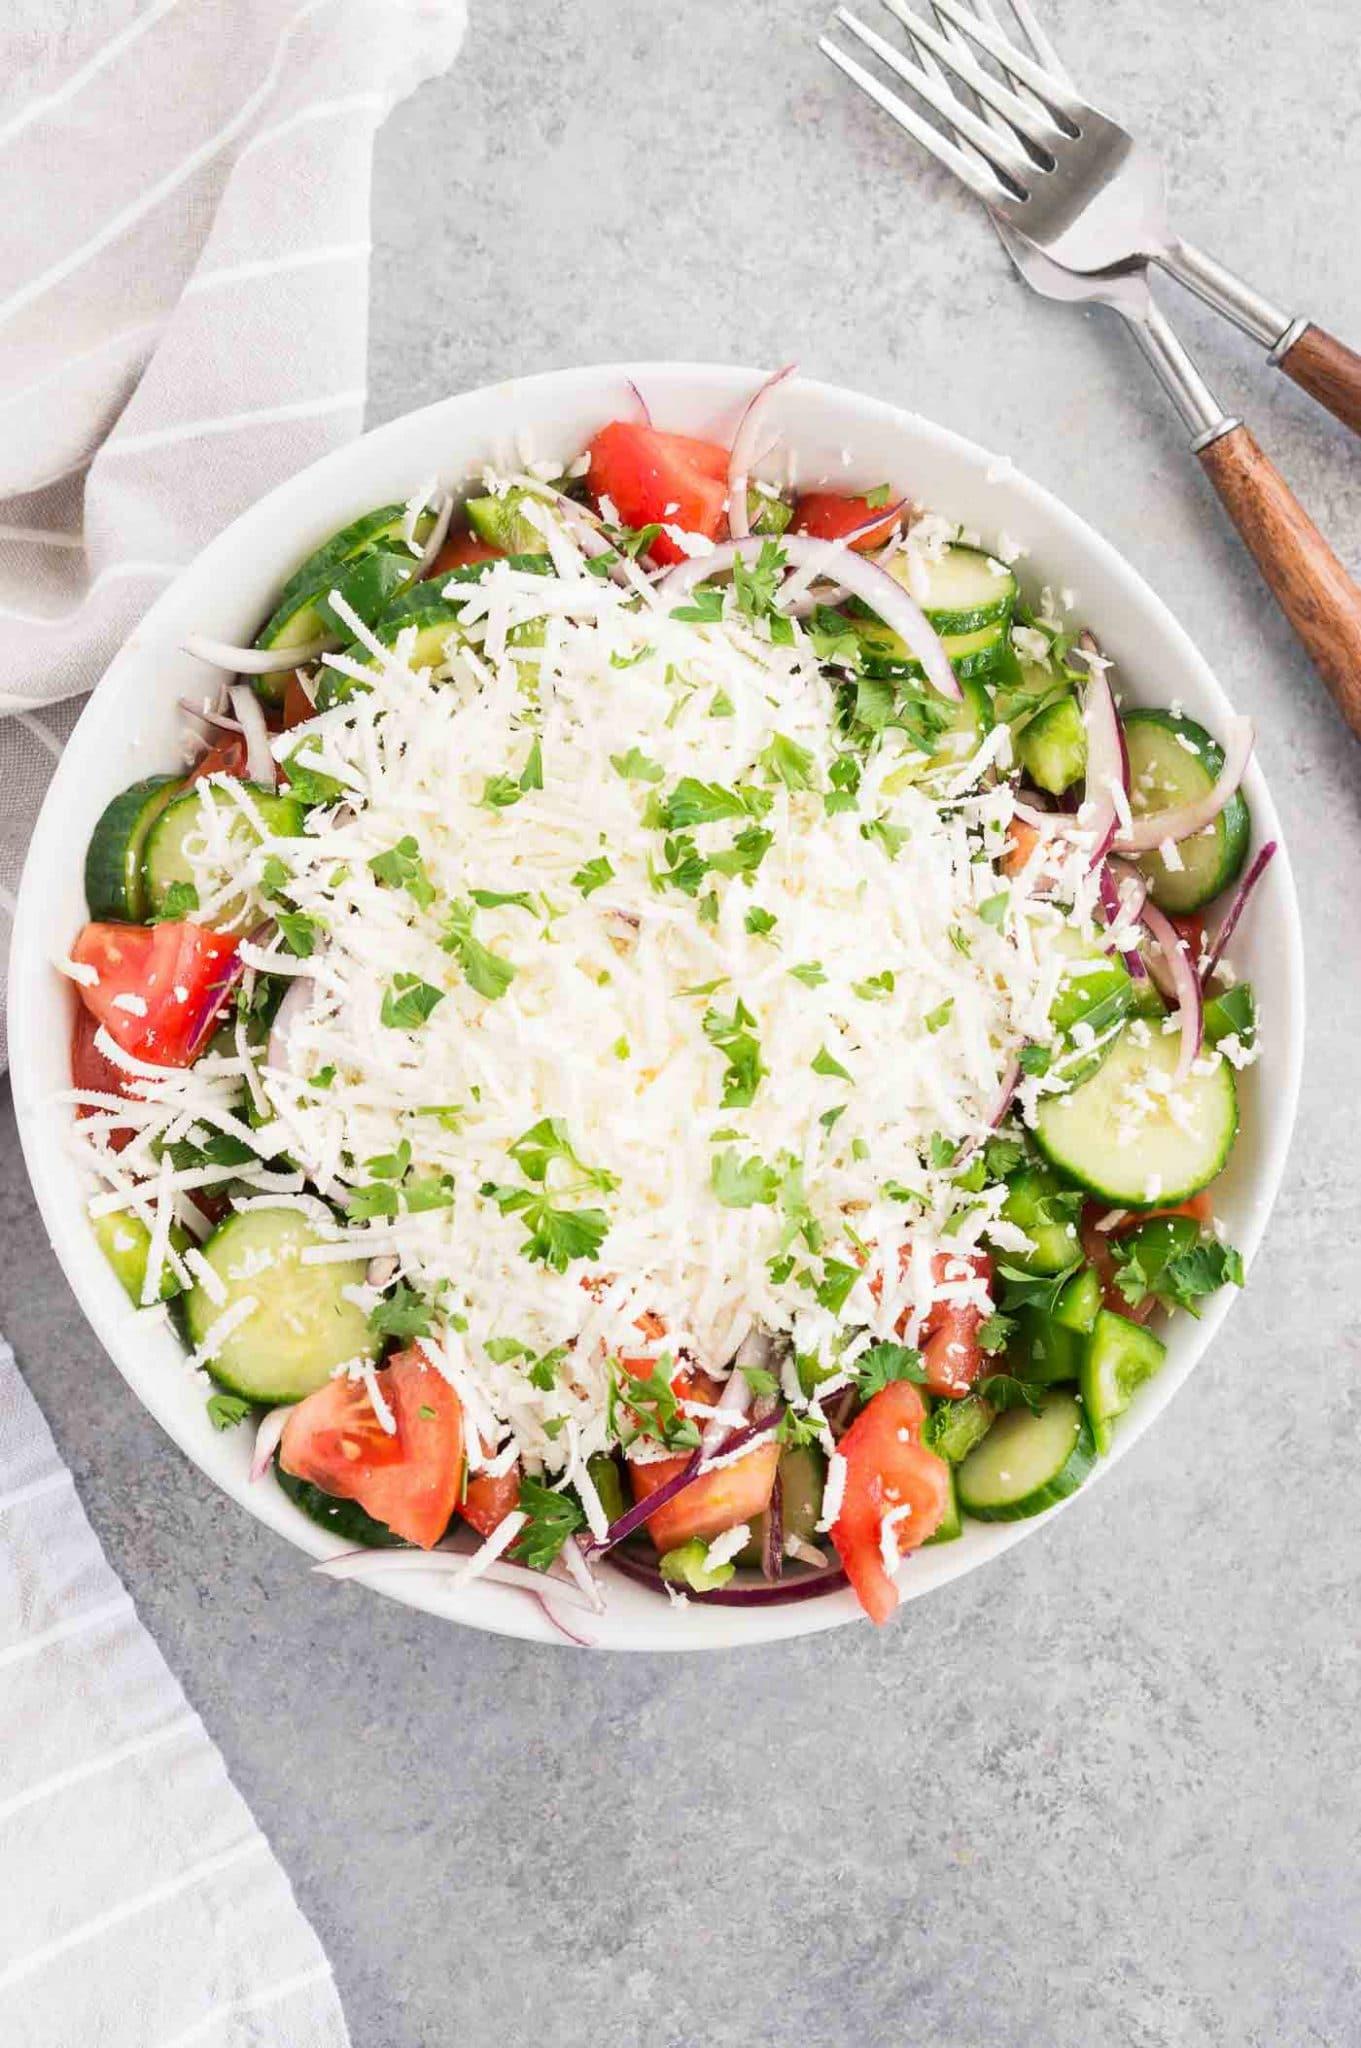 shopska salad - bulgarian salad with feta cheese in a bowl